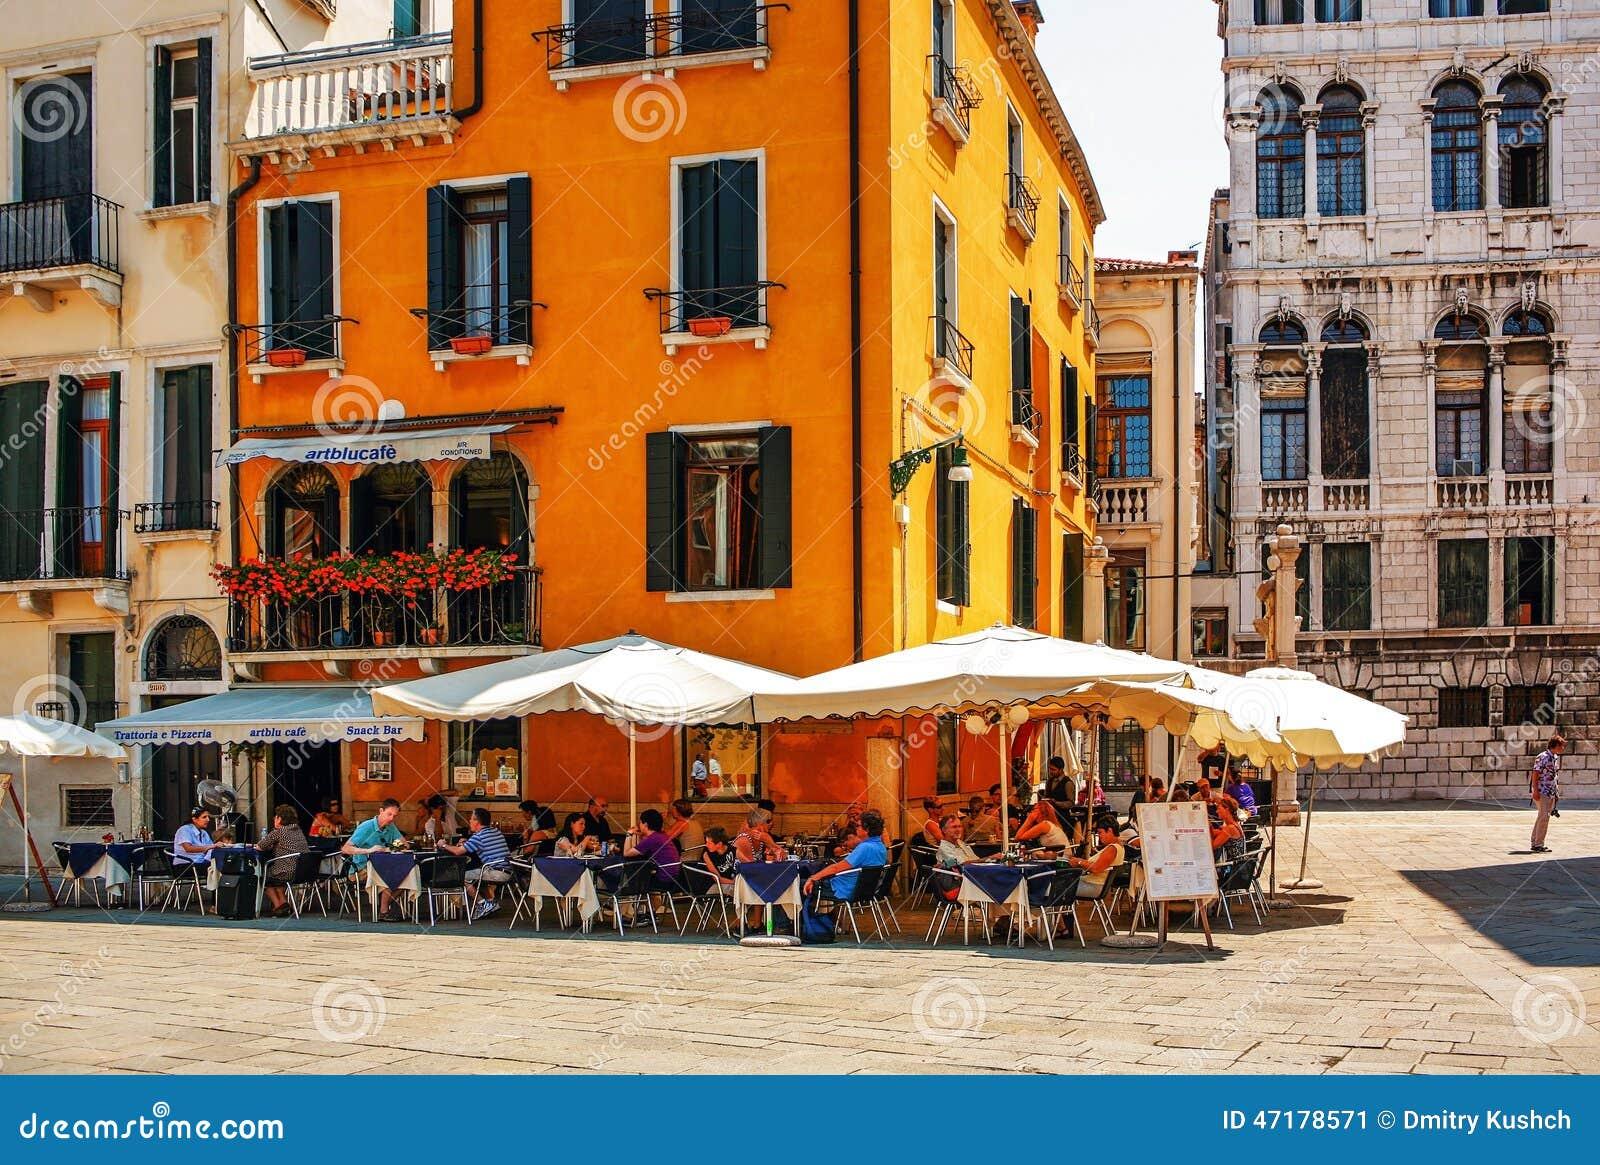 Cafe Blue In Venice